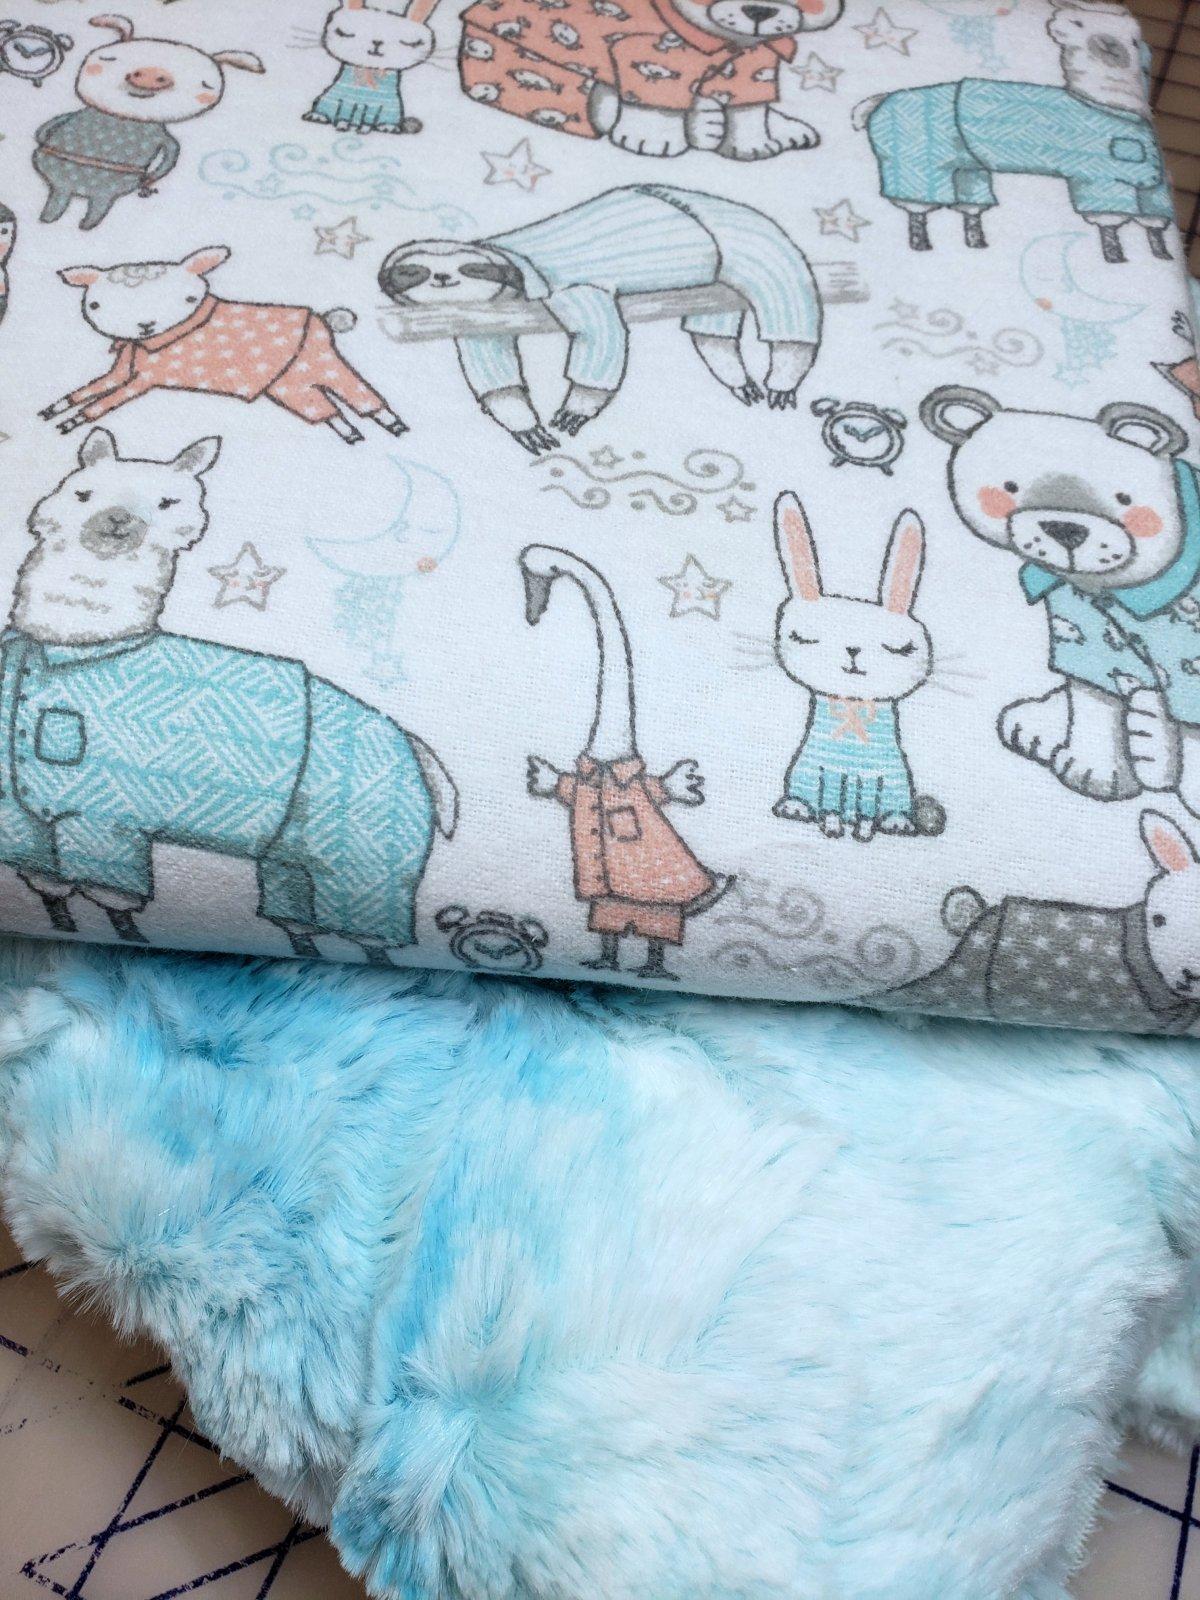 5 Minute Miter Kit - Toddler Size - Pajama Party